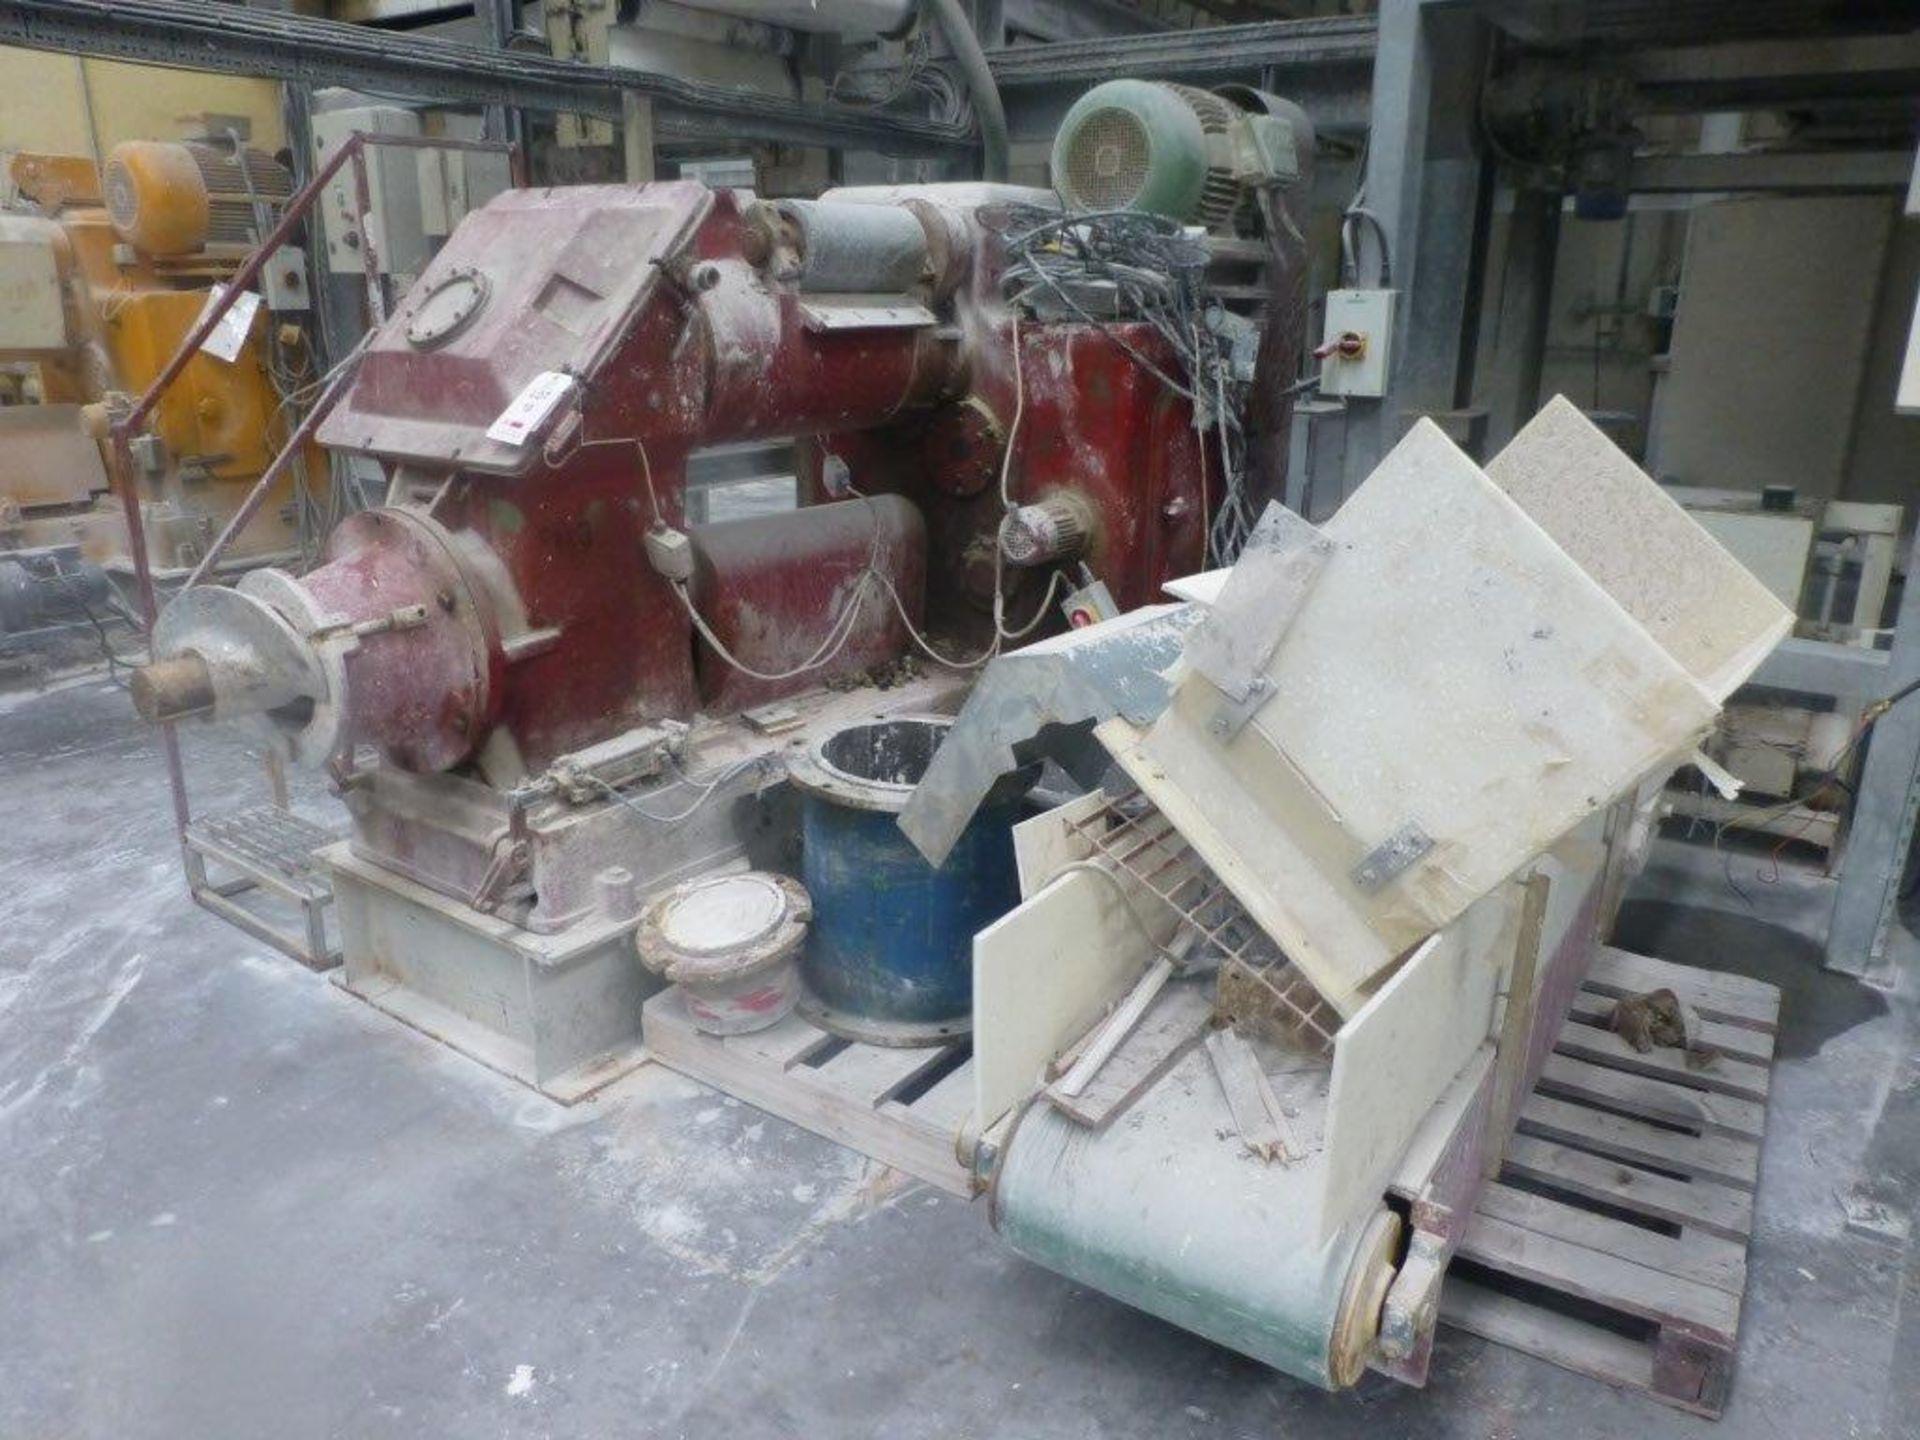 Lot 10 - Ortlinghaus Werk Kupplung top feed VIT clay Pug, serial No 78-15440, Plant No SHPG1 CHINA PUG 1 (